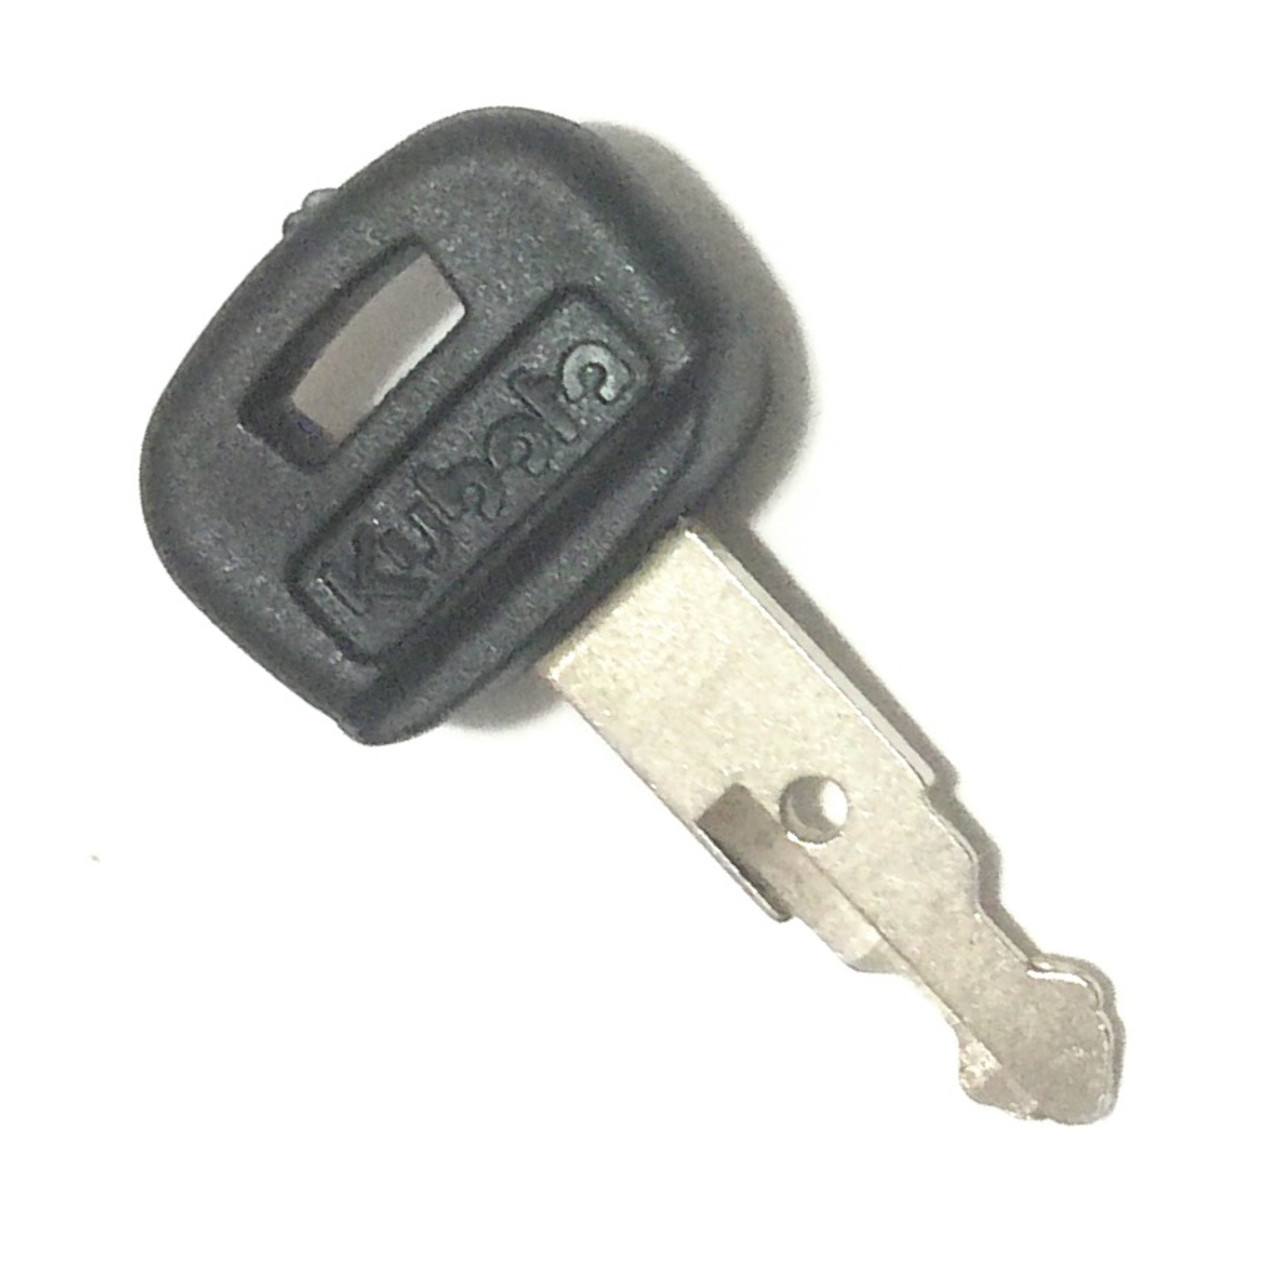 Kubota RC461-53930 Key, Starter